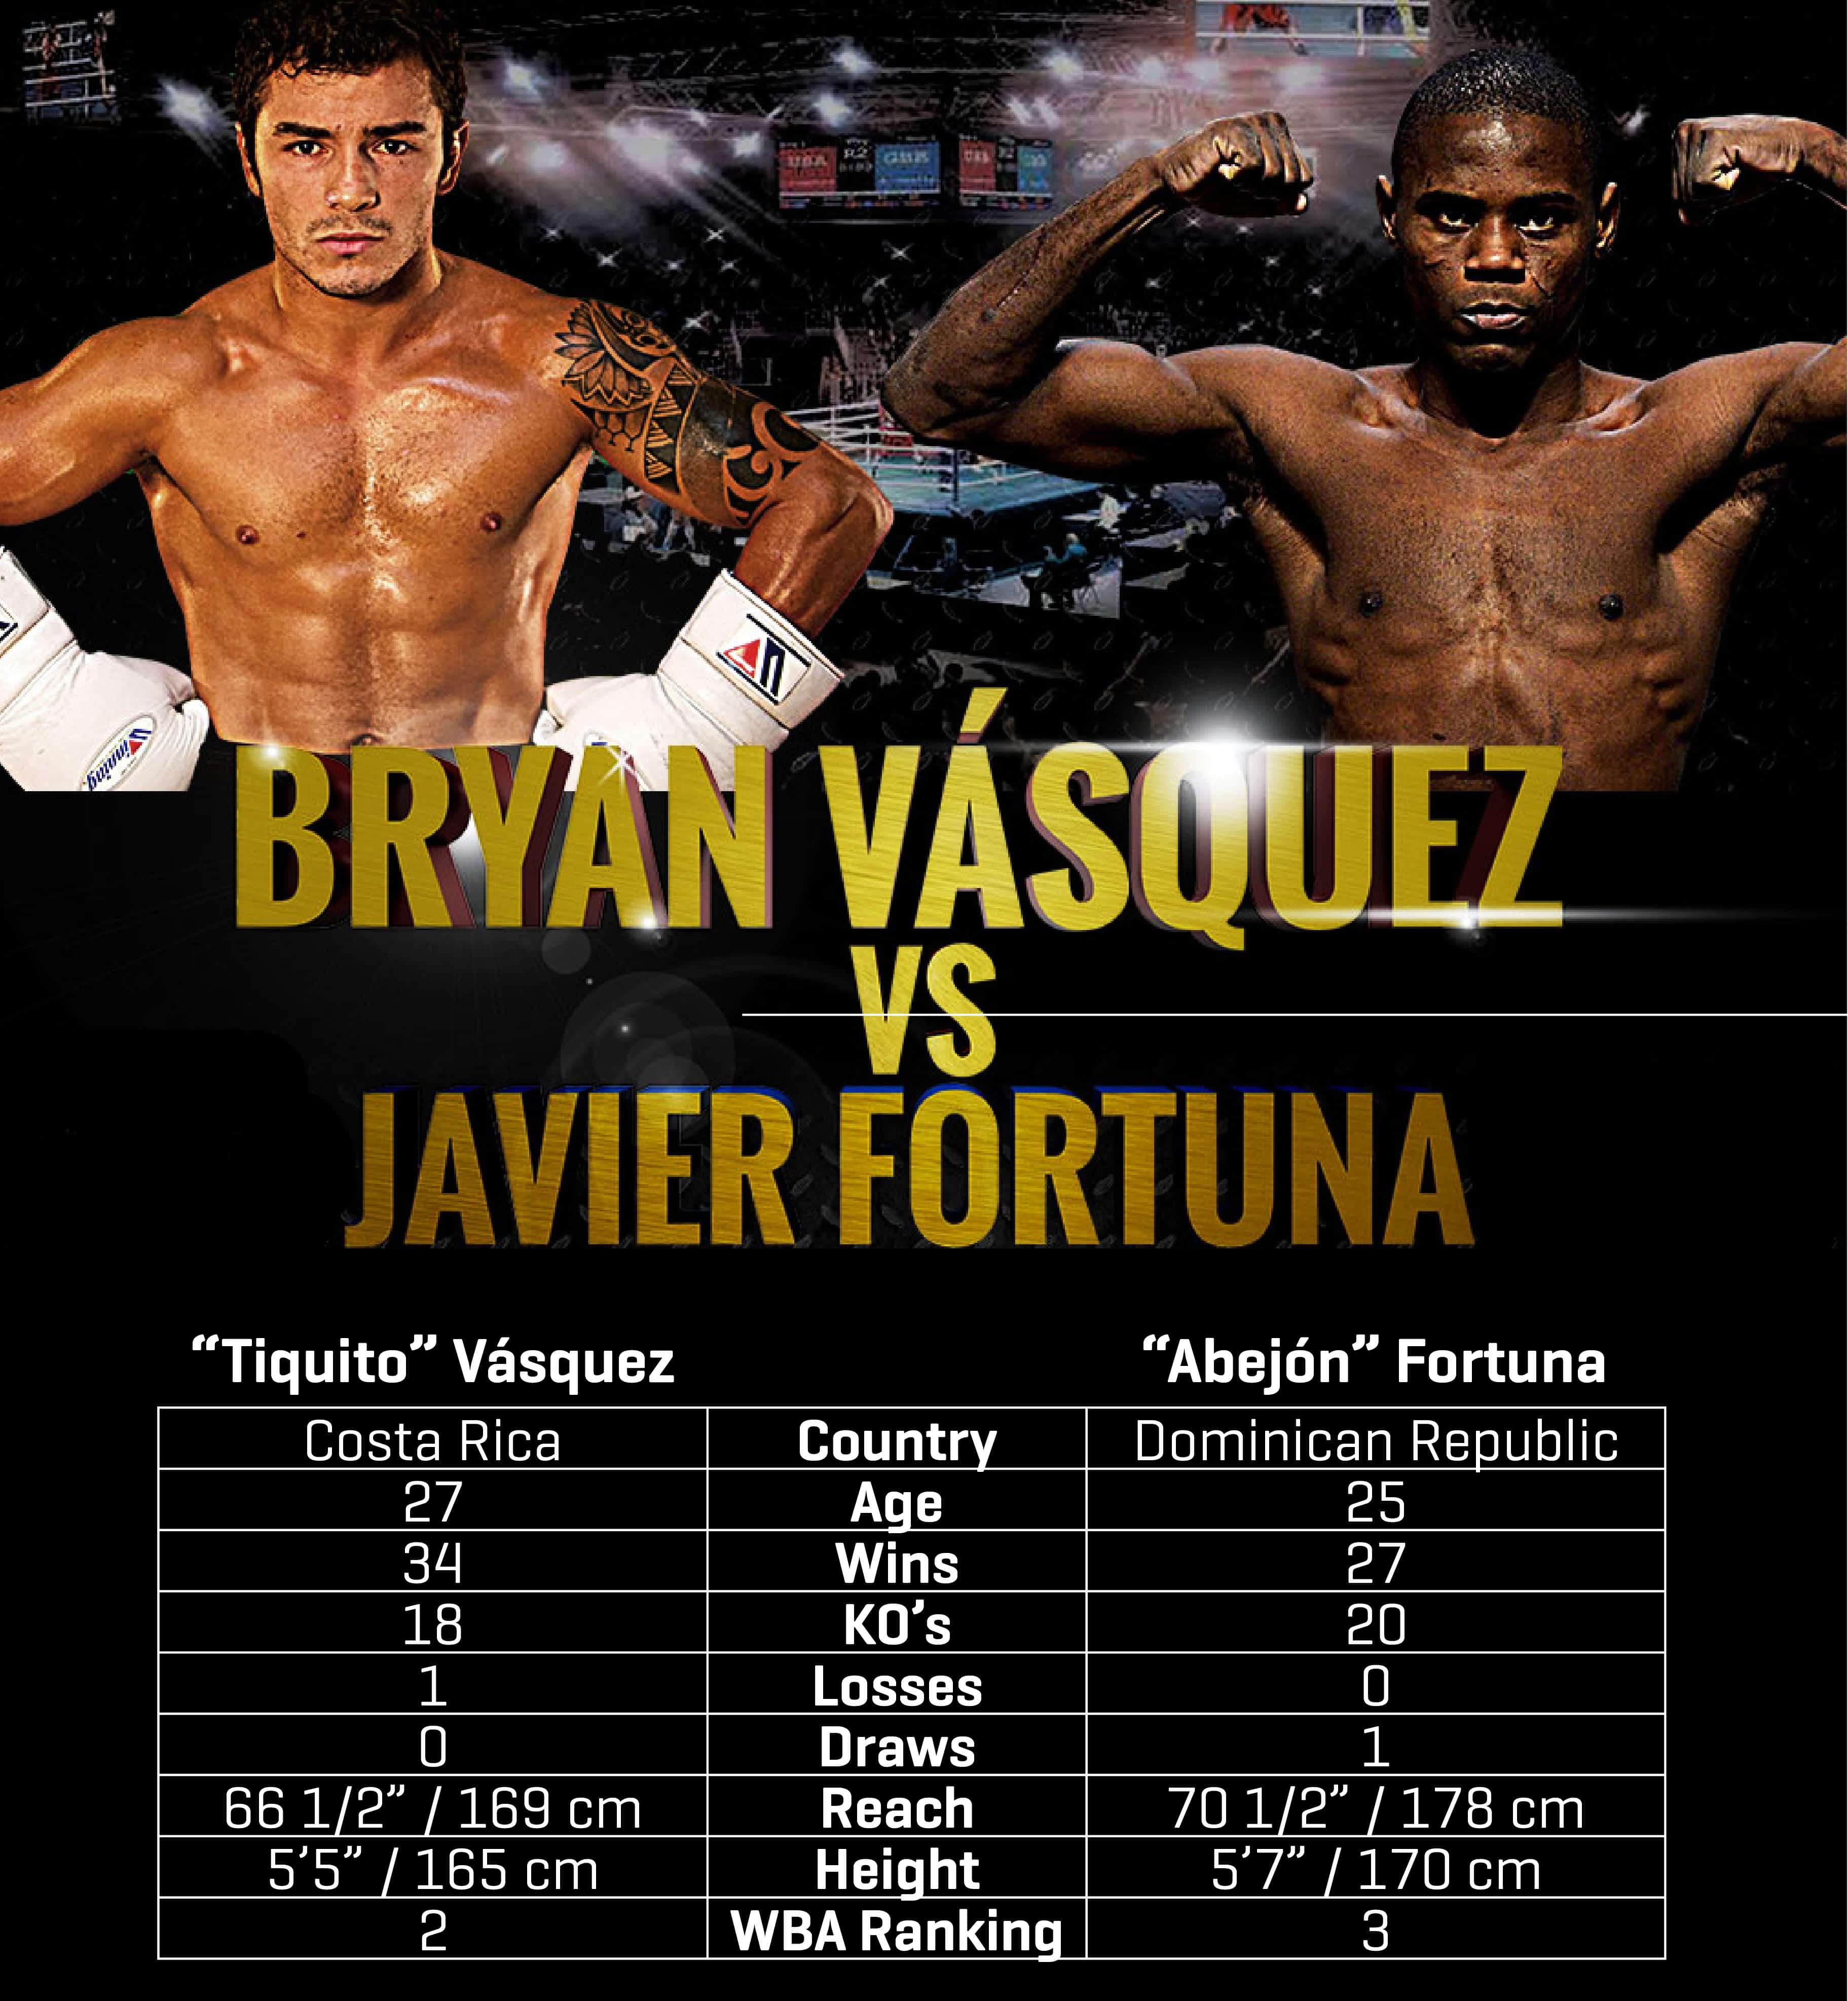 Bryan Vásquez vs Javier Fortuna